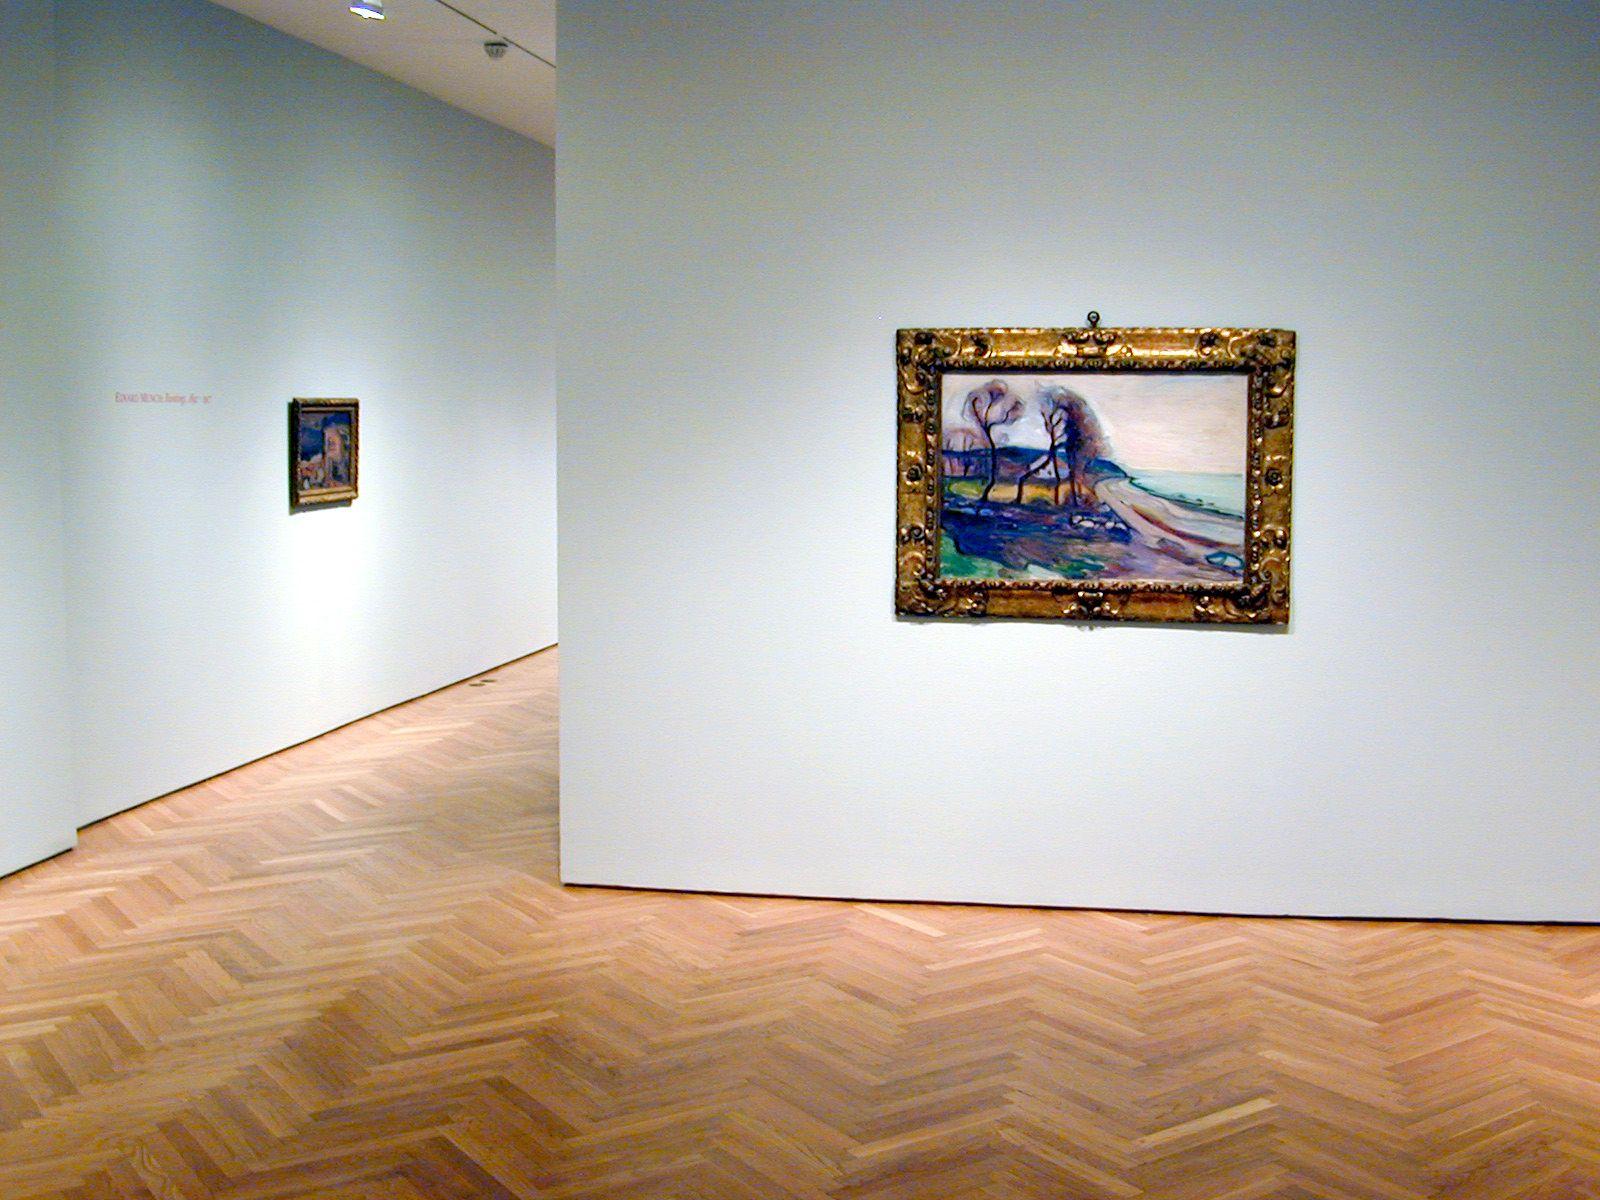 EDVARD MUNCH Paintings, 1892-1917